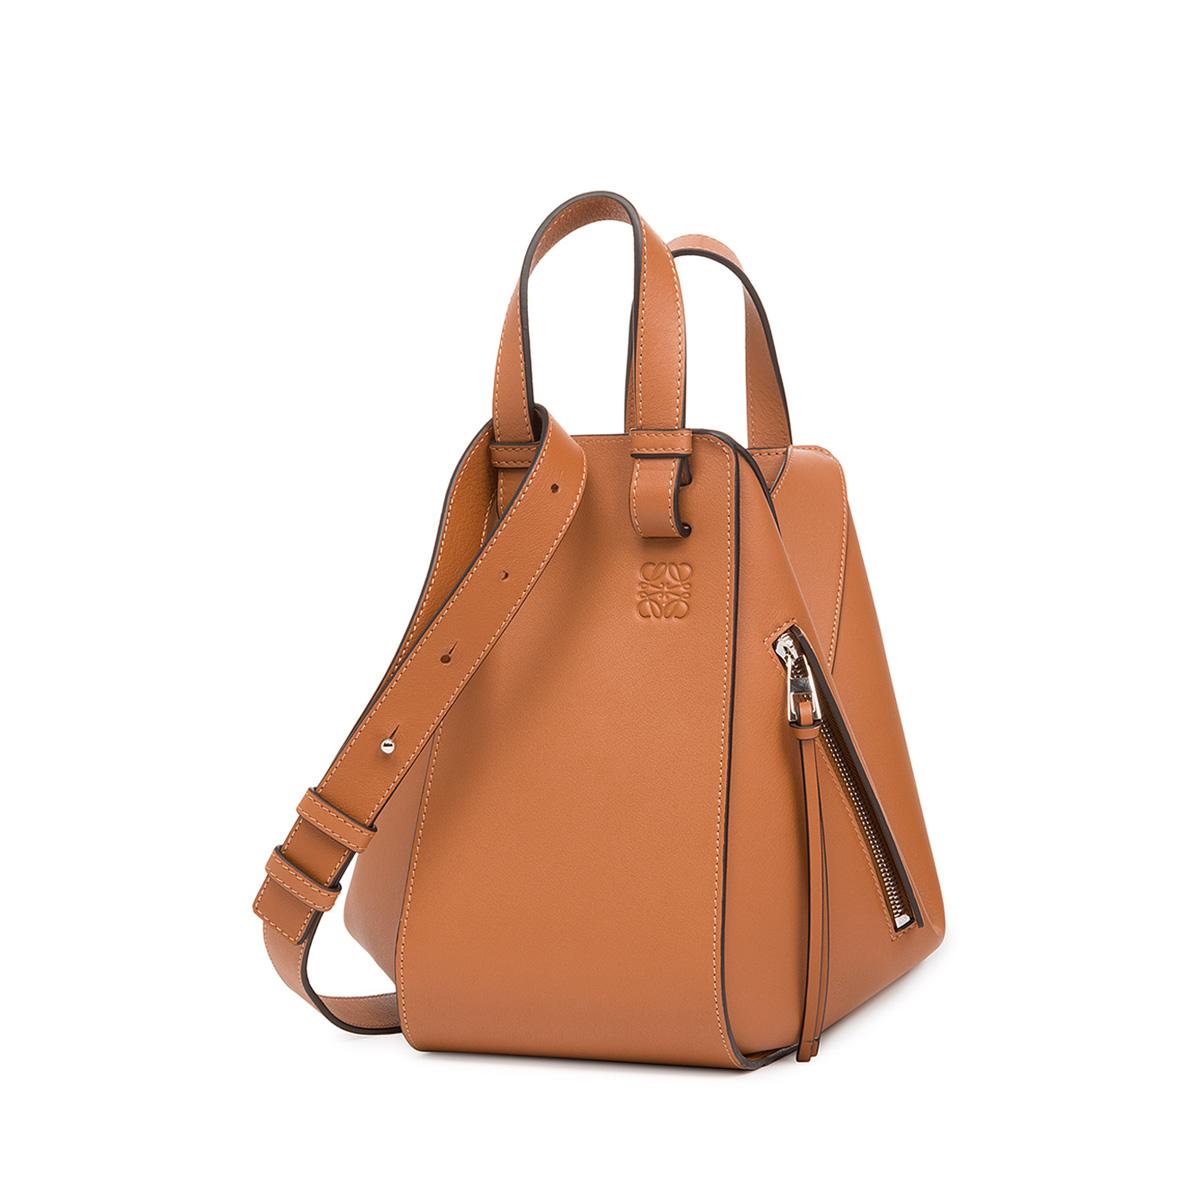 8b10e8bb0531 Hammock Small Bag Tan - LOEWE